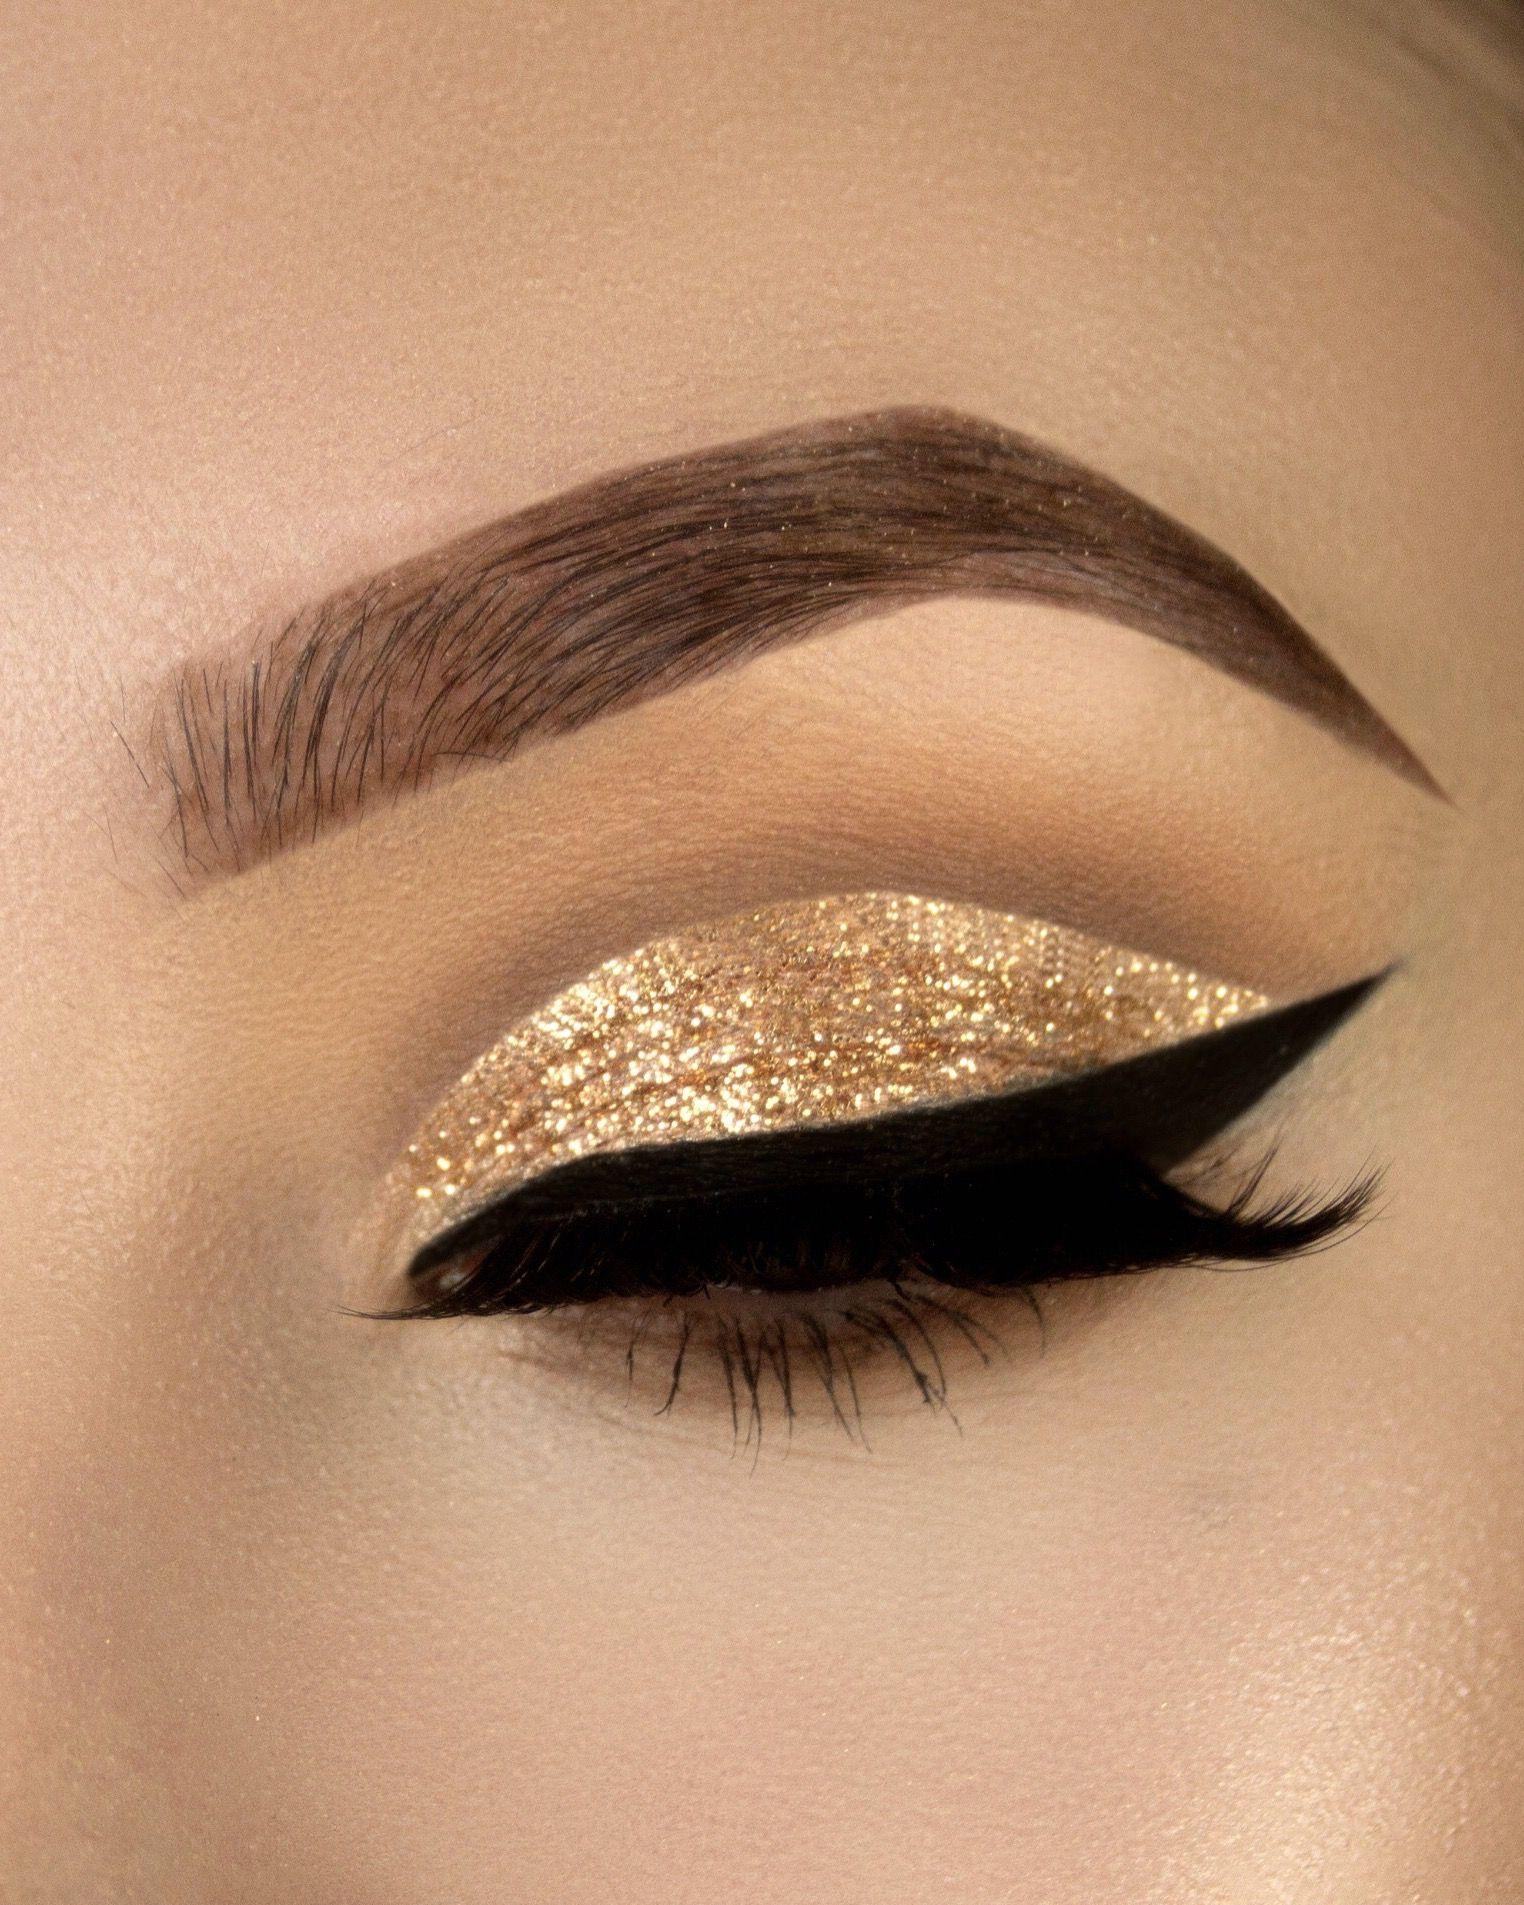 Gold glitter cut crease makeup tutorial httpsyoutu gold glitter cut crease makeup tutorial httpsyoutujiovwlm560m glitter baditri Images